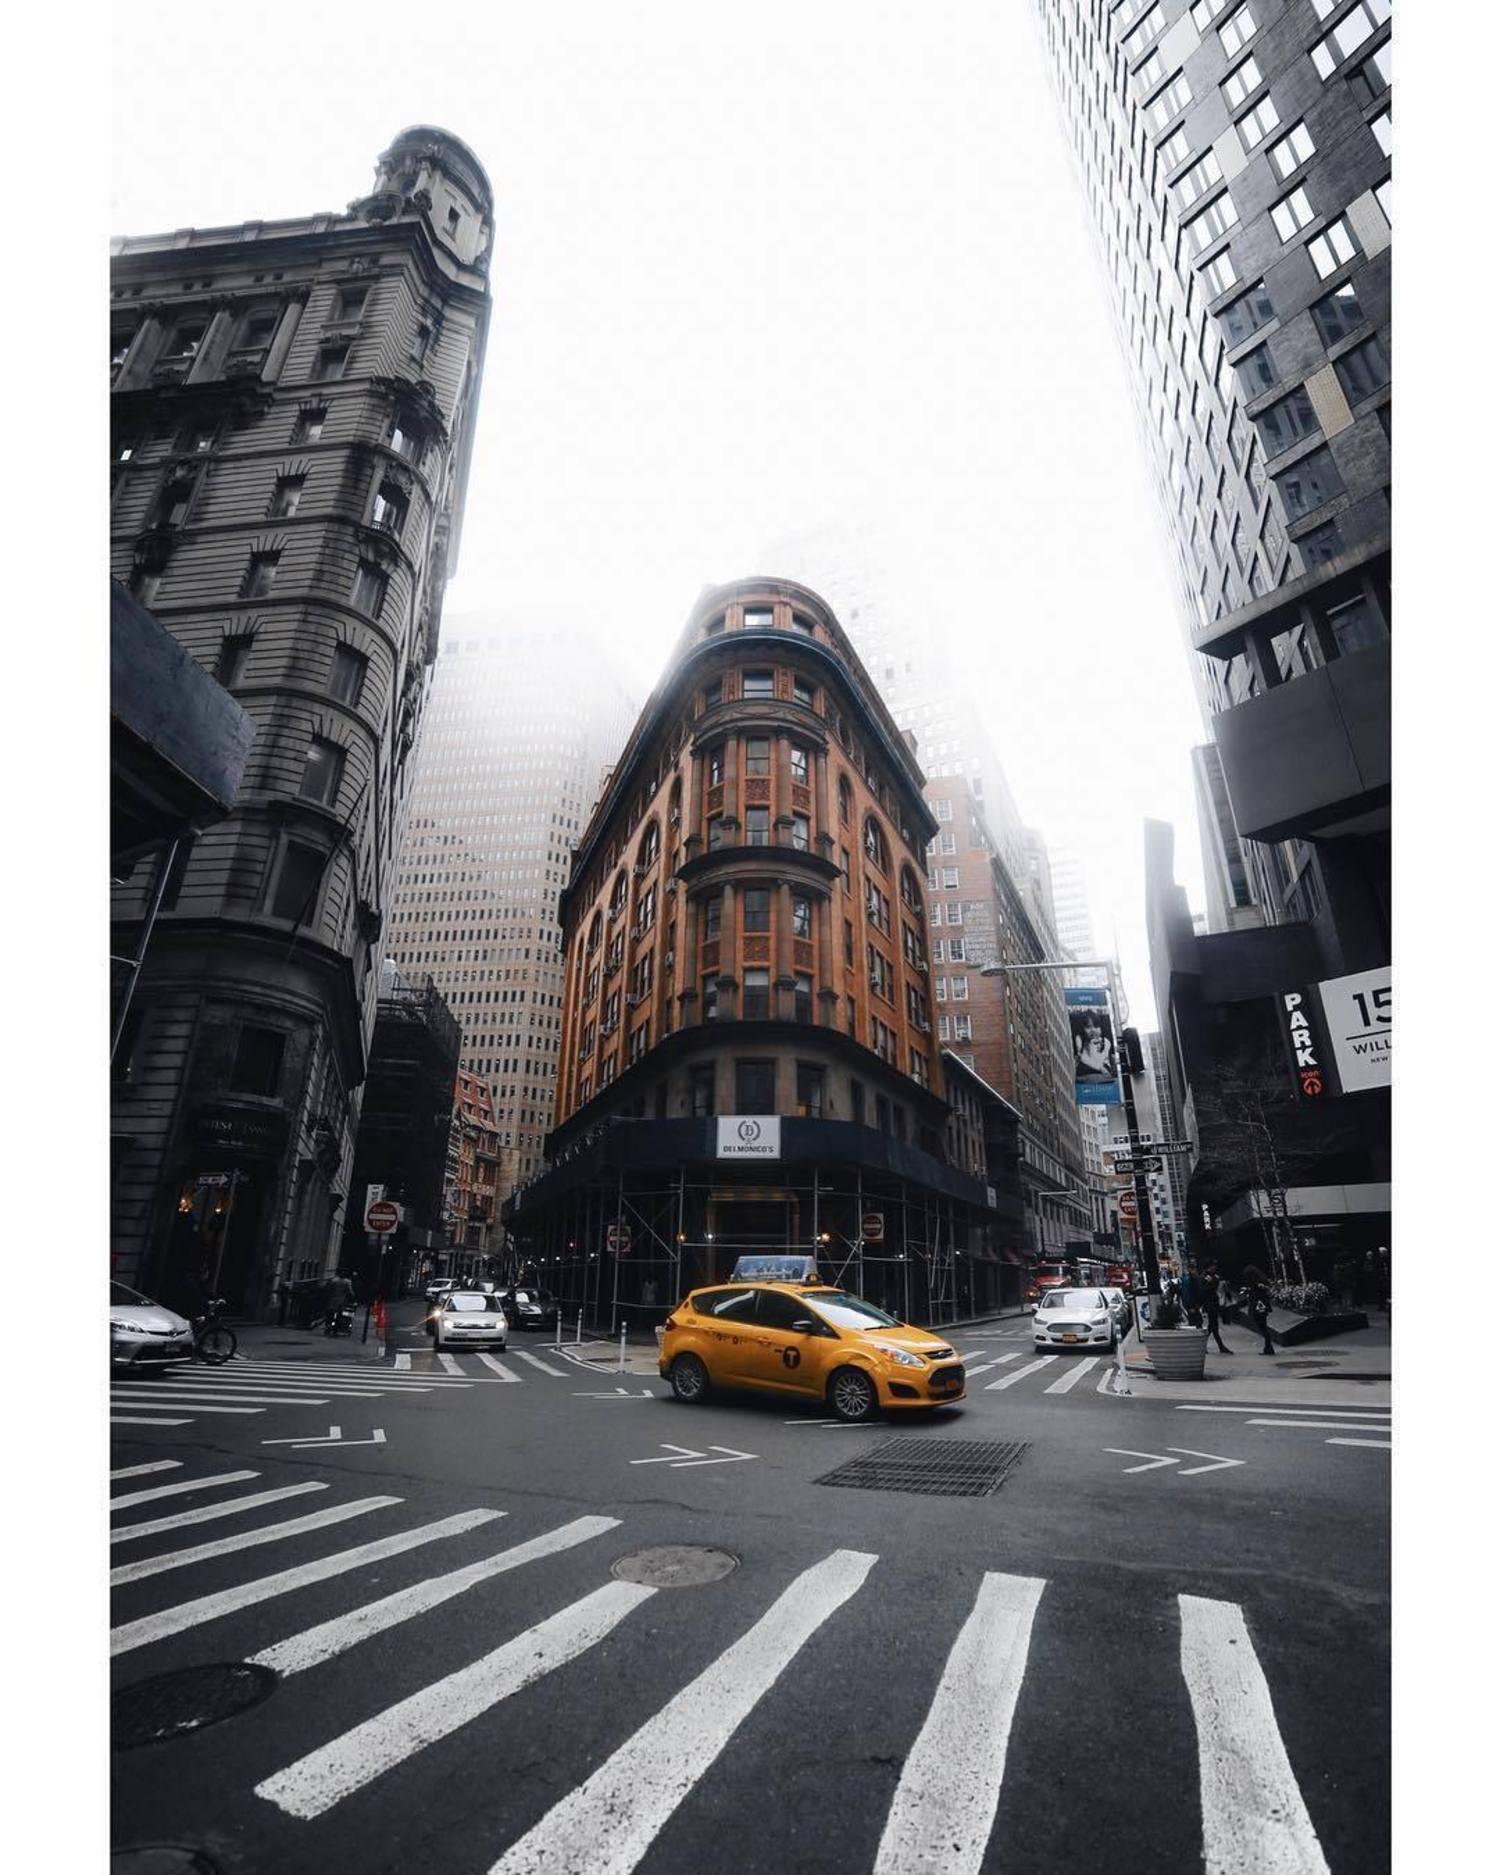 New York, New York. Photo via @raylivez #viewingnyc #newyork #nyc #newyorkcity